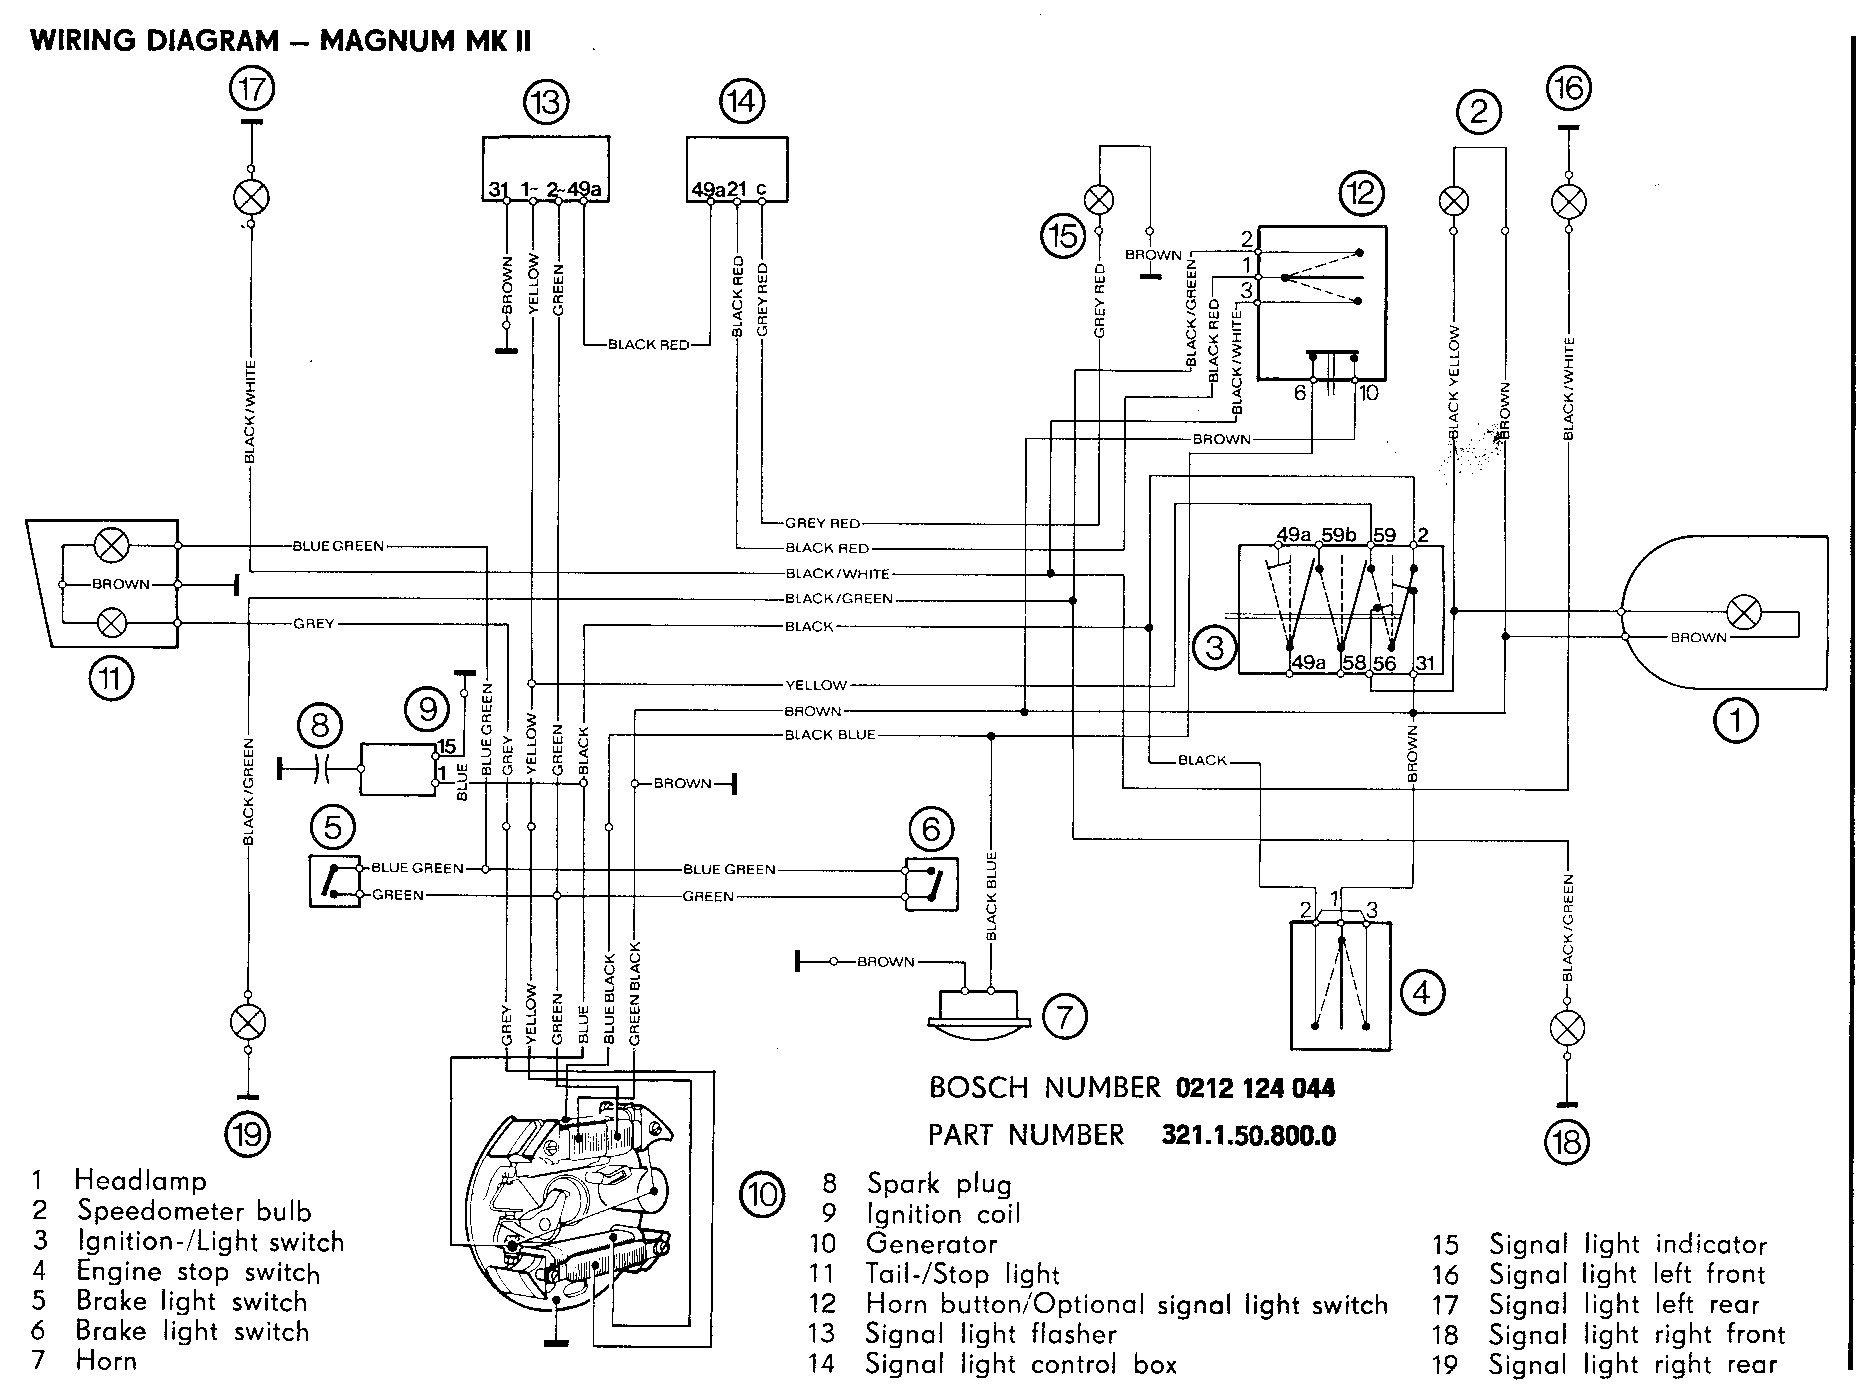 Dodge Magnum Turn Signal Wiring Diagram Electrical Diagrams 2000 Chrysler Town And Country Dakota 1992 Lexus Es300 Engine Timing